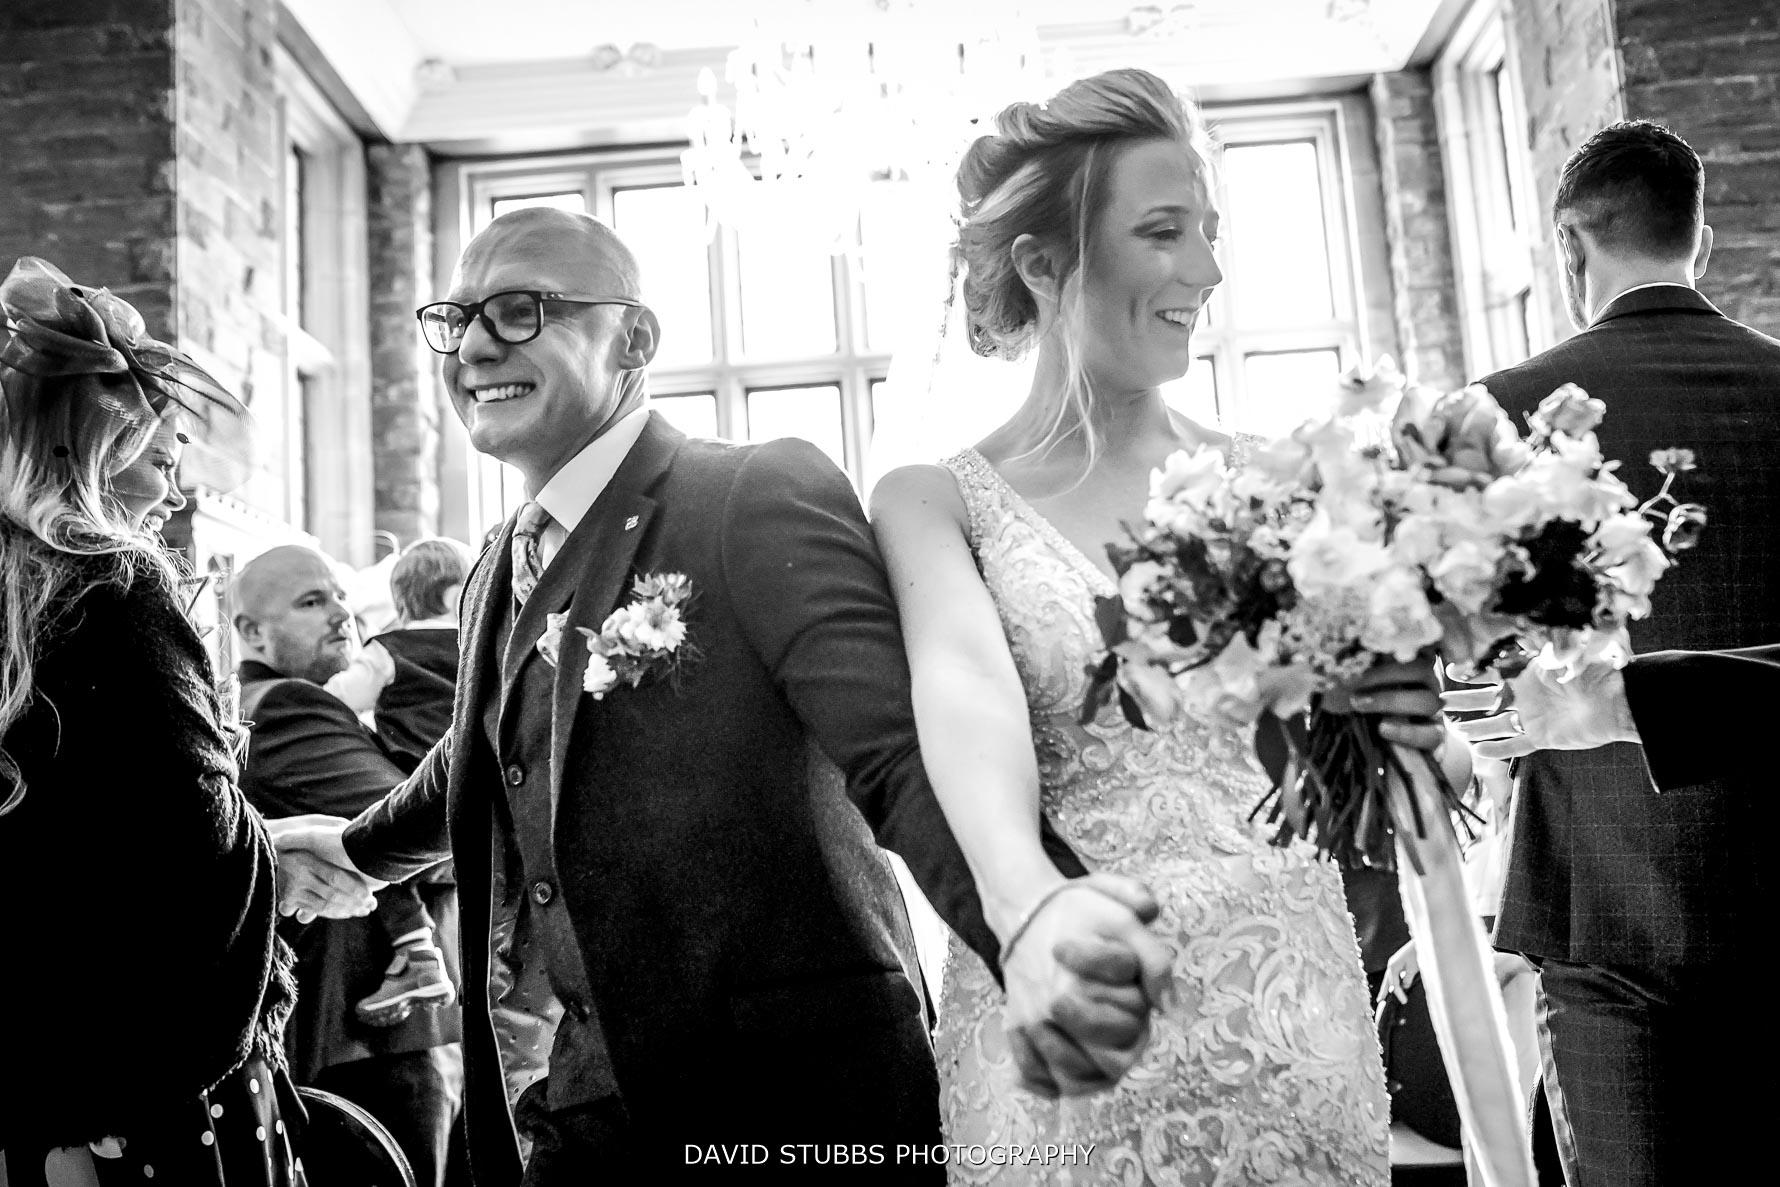 newlyweds cerebrate marriage